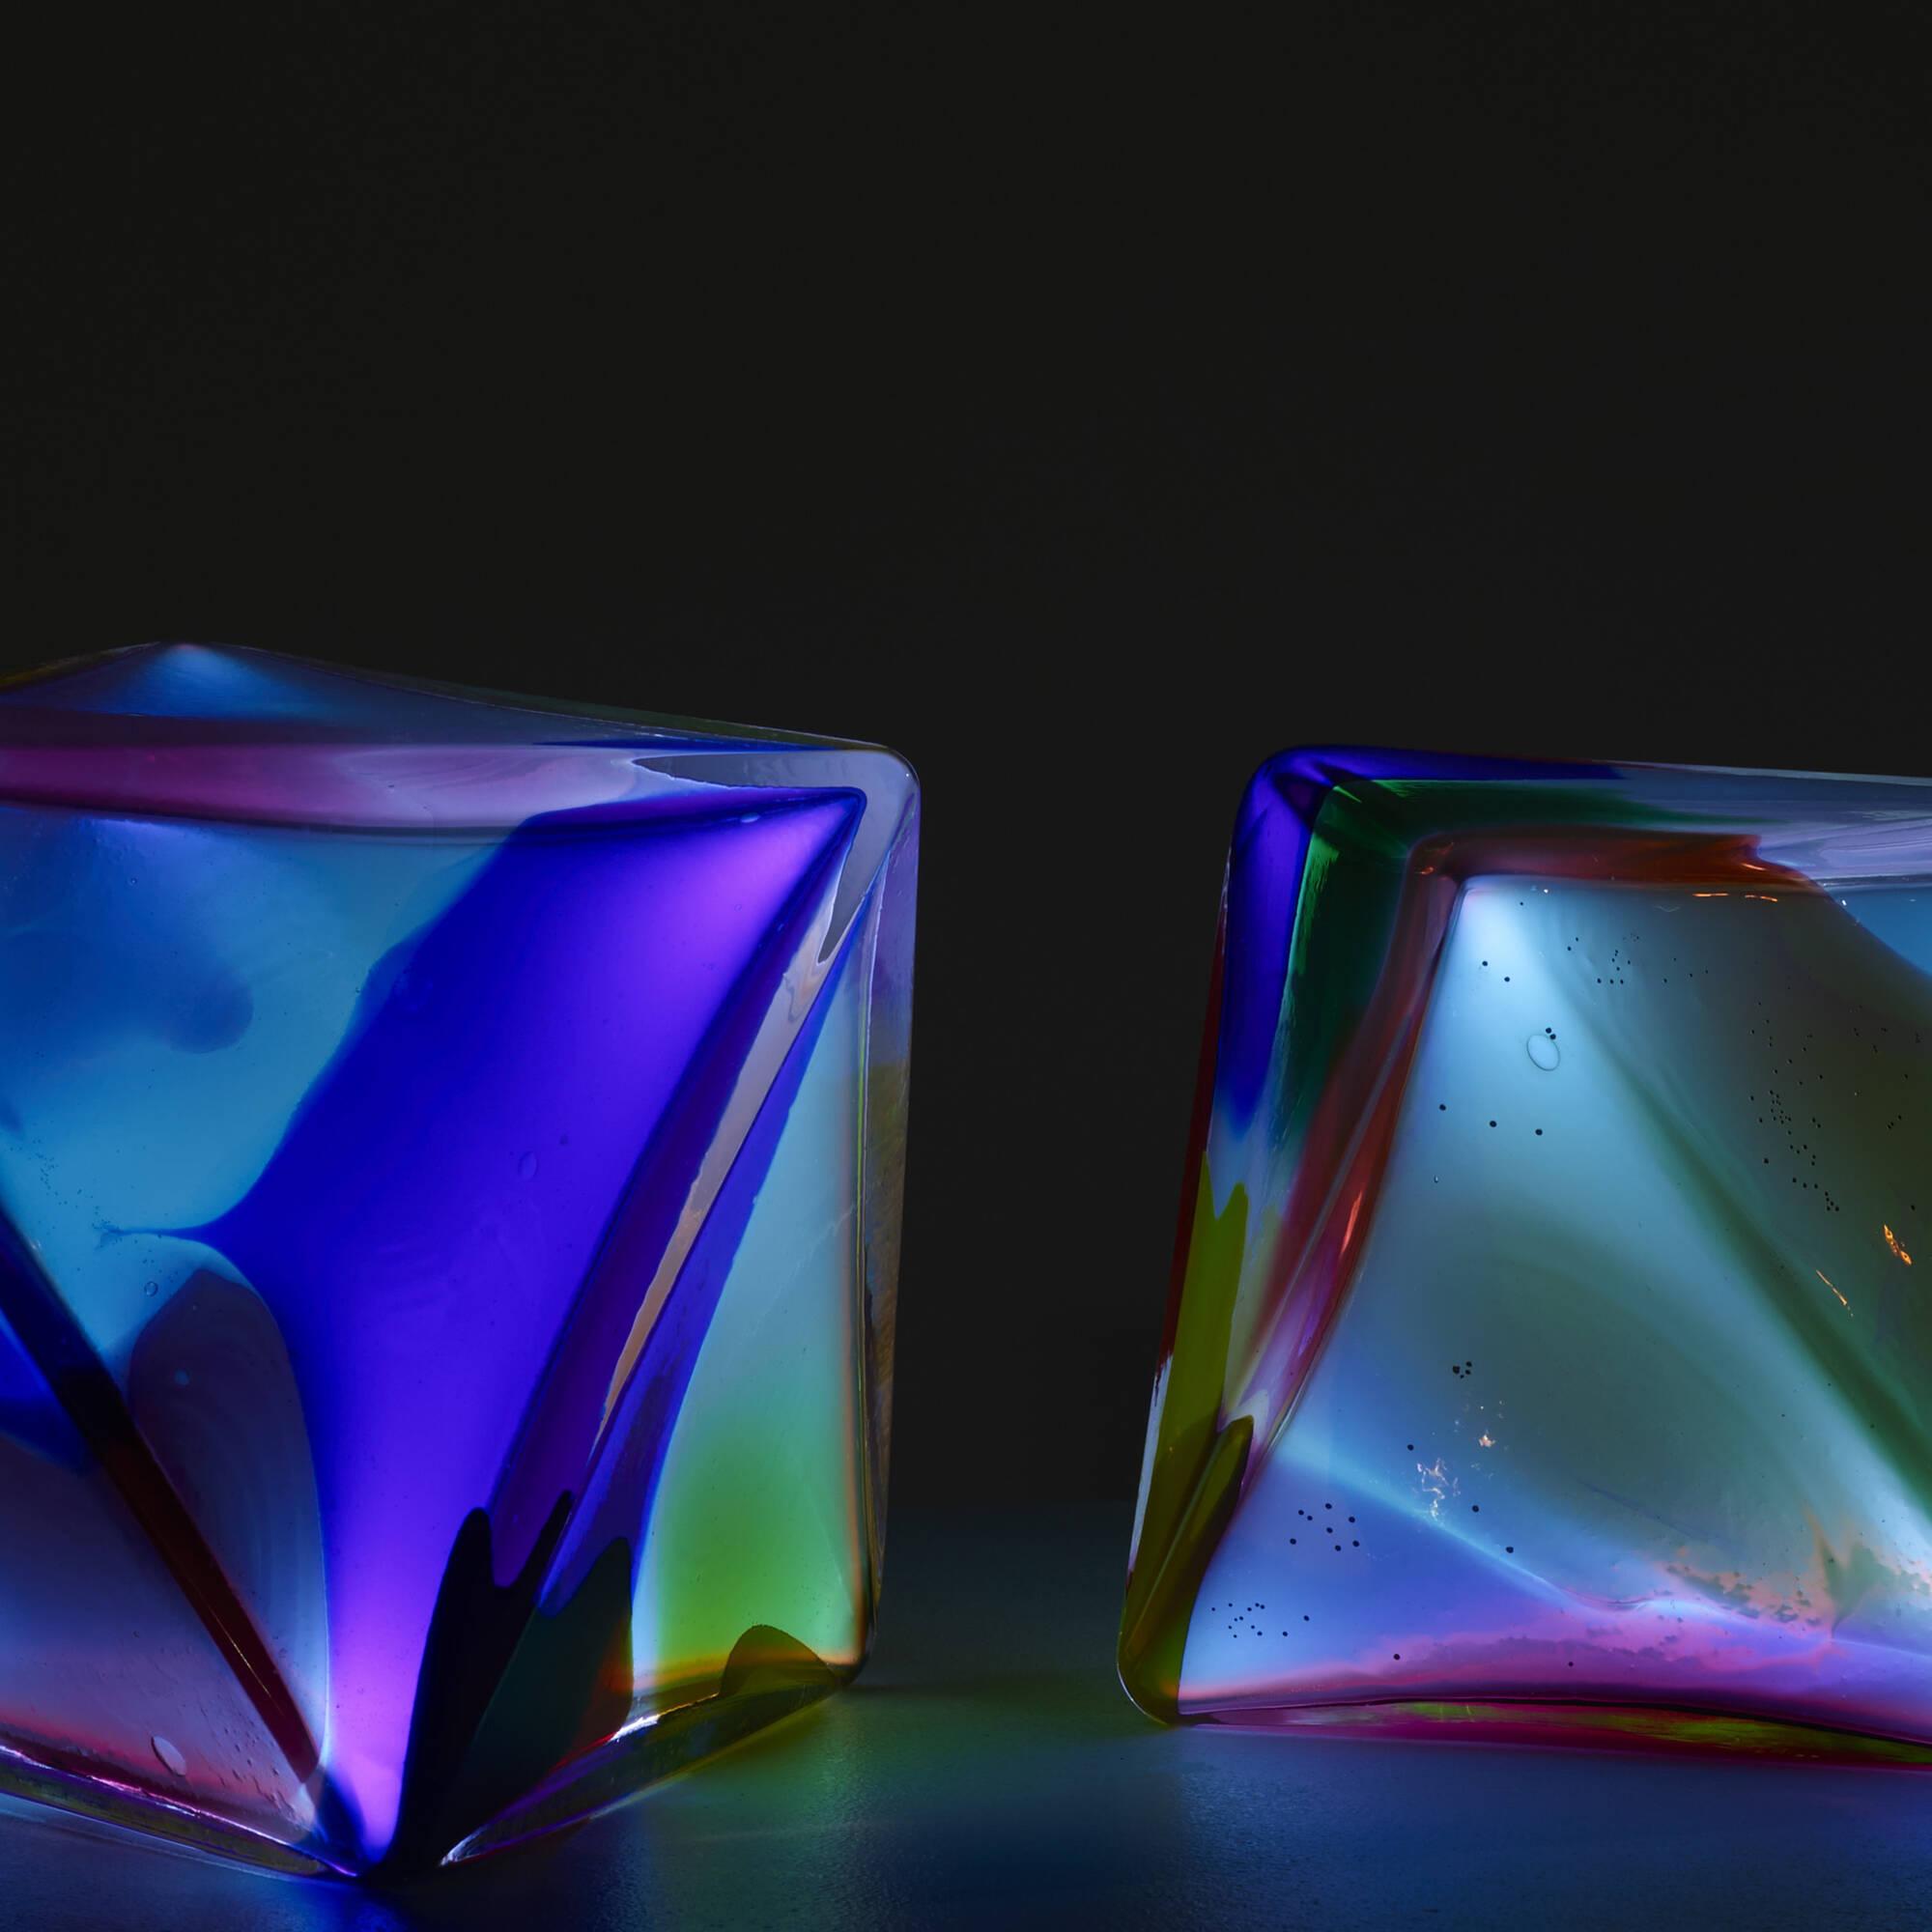 146: Paul Seide / Crystal Construction (4 of 7)